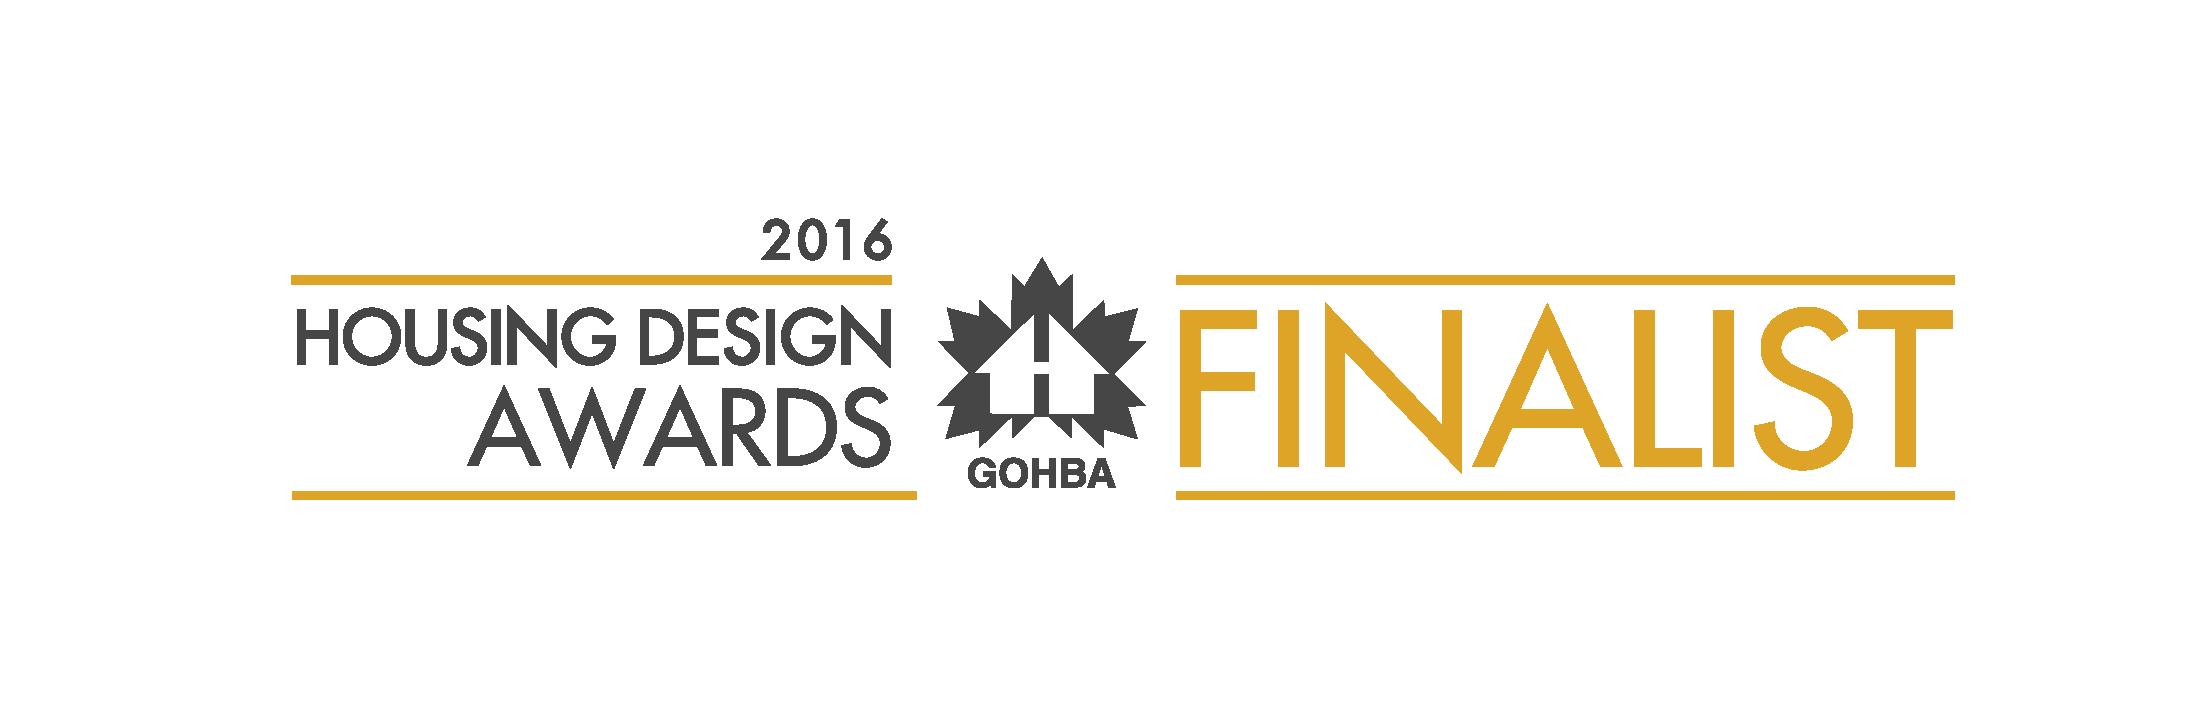 160067_GOHB_HDA_Finalist_Winner_Logos_FINAL